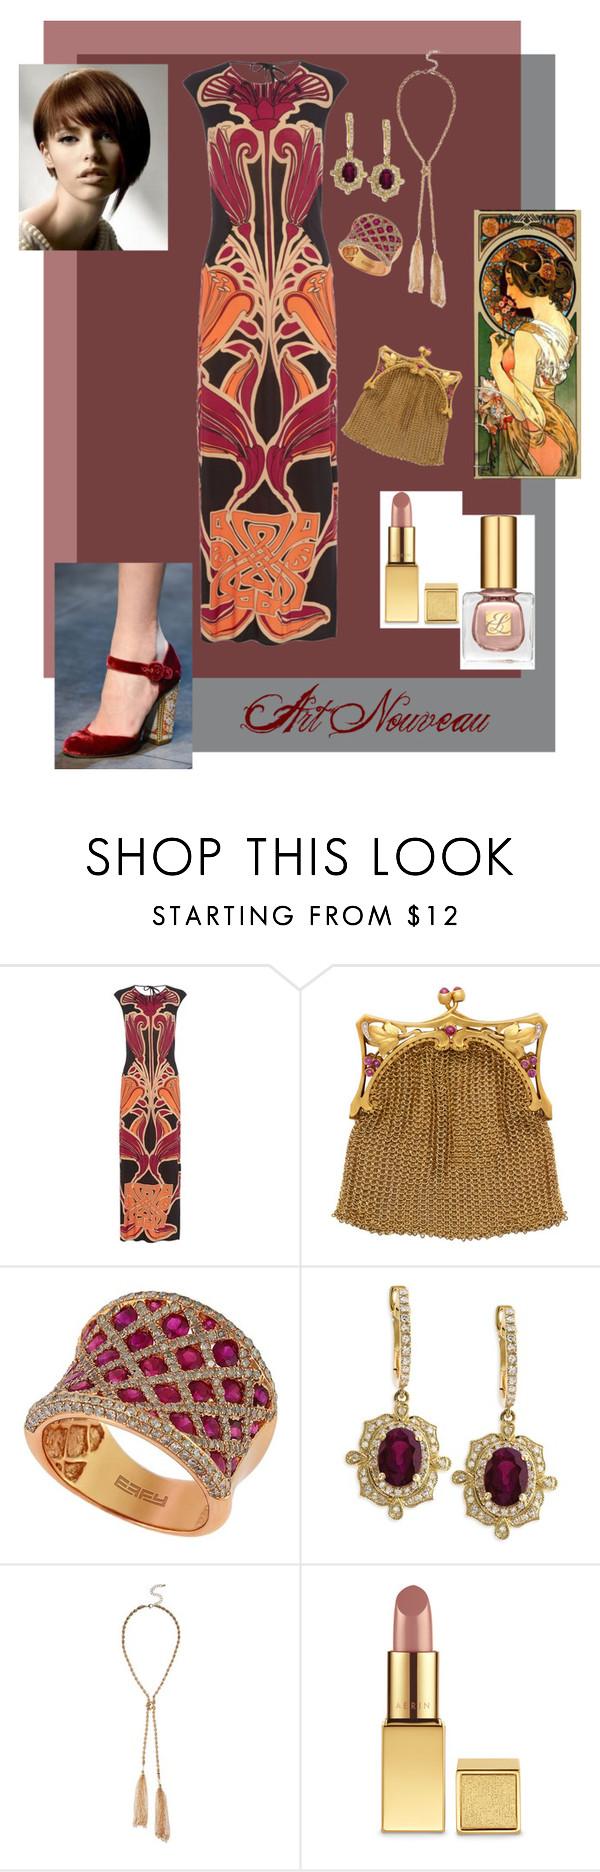 """Art Nouveau Style"" by lacehearts58 on Polyvore featuring Dolce&Gabbana, Biba, Effy Jewelry, AERIN, Estée Lauder, burgundy and artnouveau"